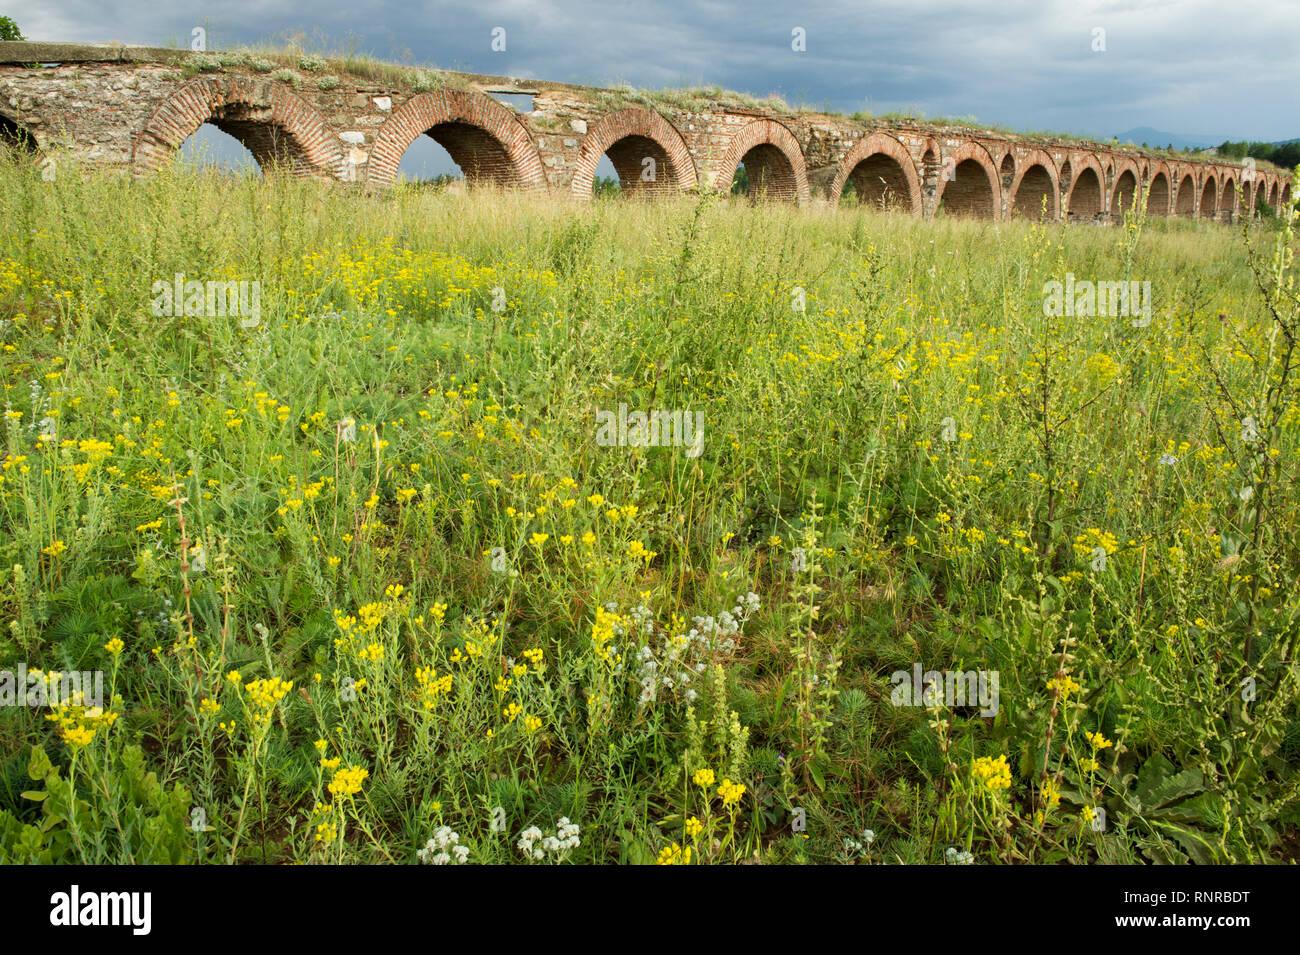 Skopje Aqueduct, Skopje, Macedonia - Stock Image